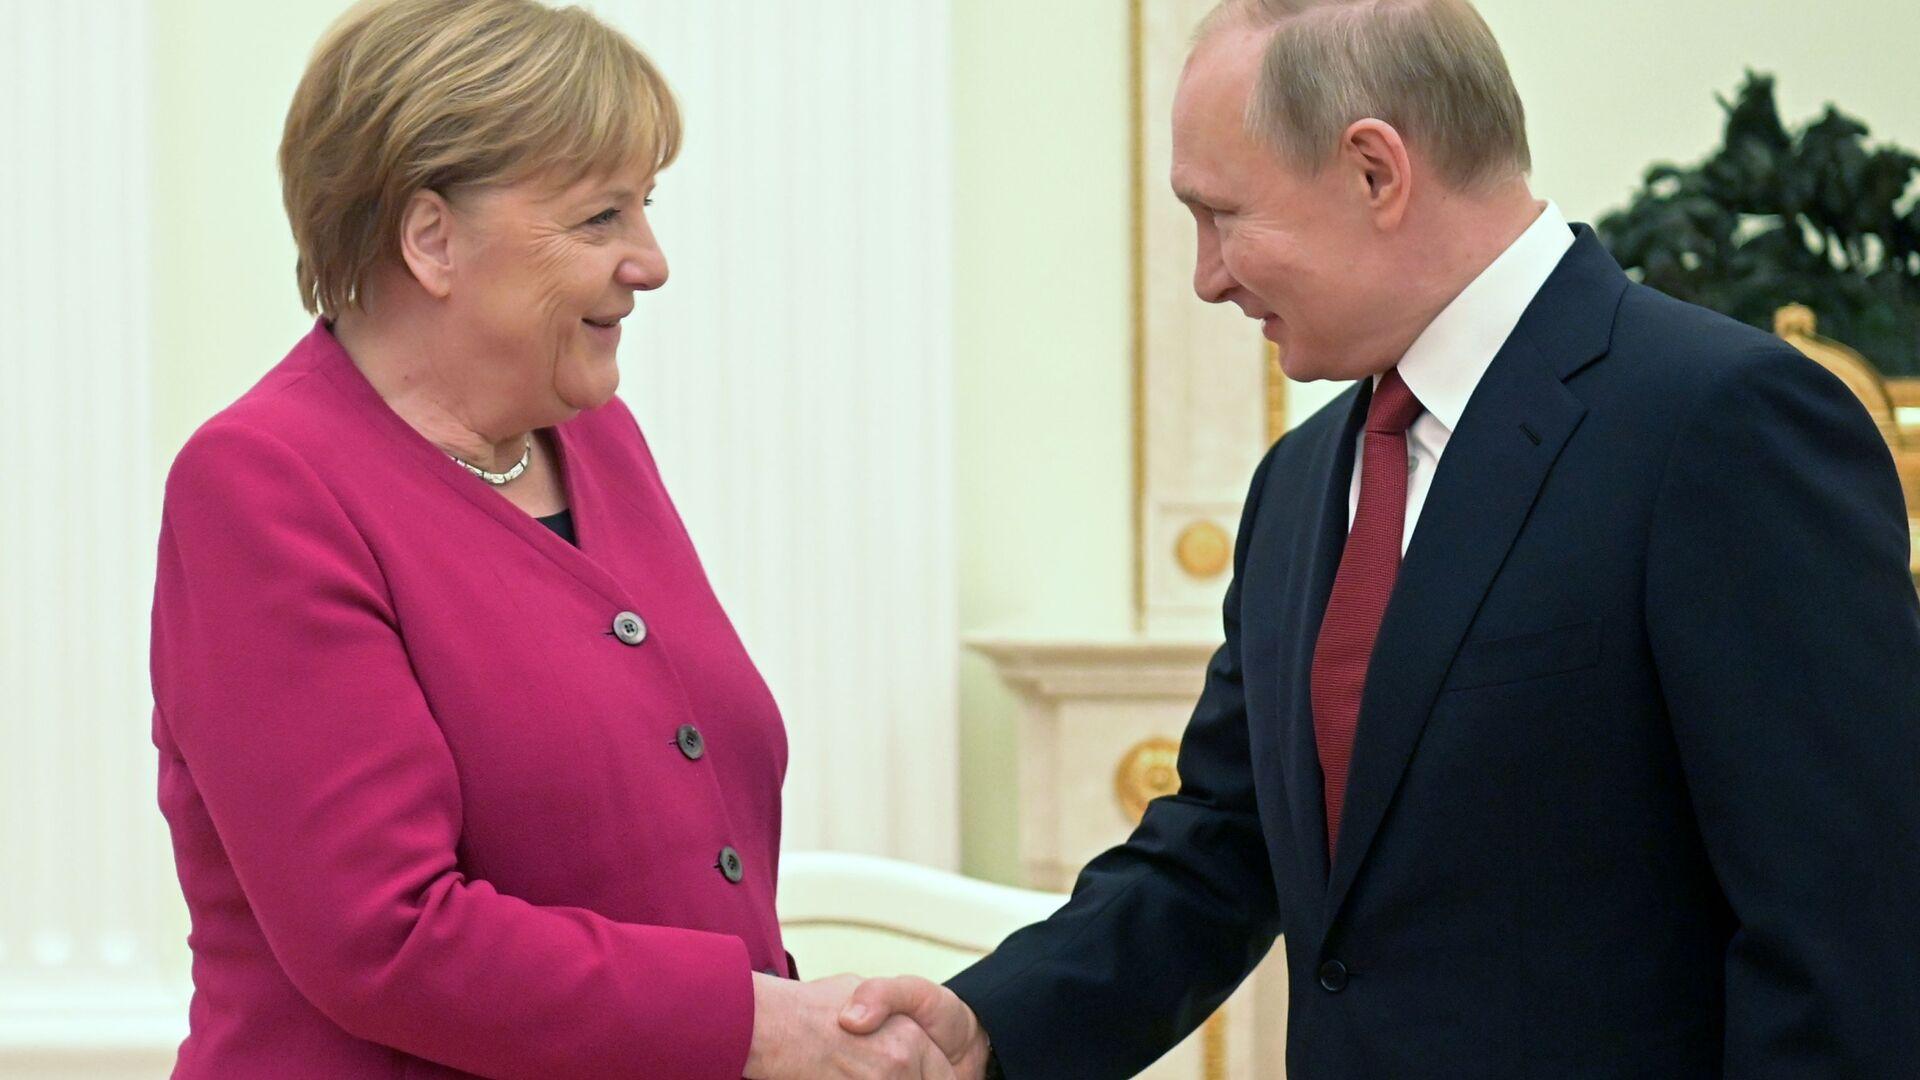 Il presidente russo Vladimir Putin e la cancelliera tedesca Angela Merkel l'11 gennaio 2020 - Sputnik Italia, 1920, 24.06.2021